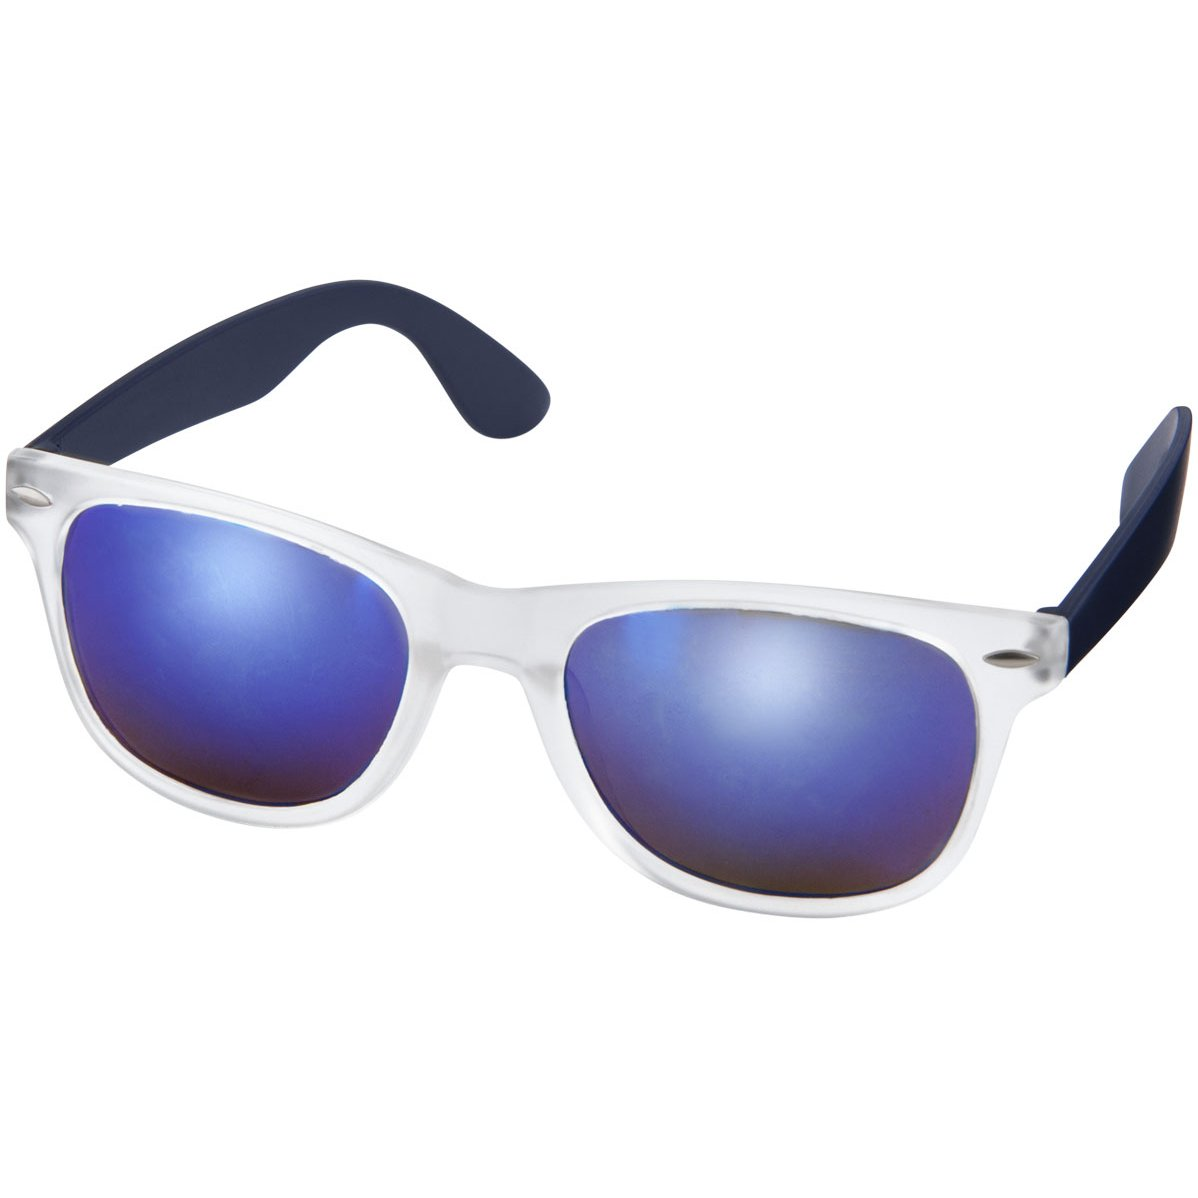 Bullet Sun Ray sunglasses with mirror lenses